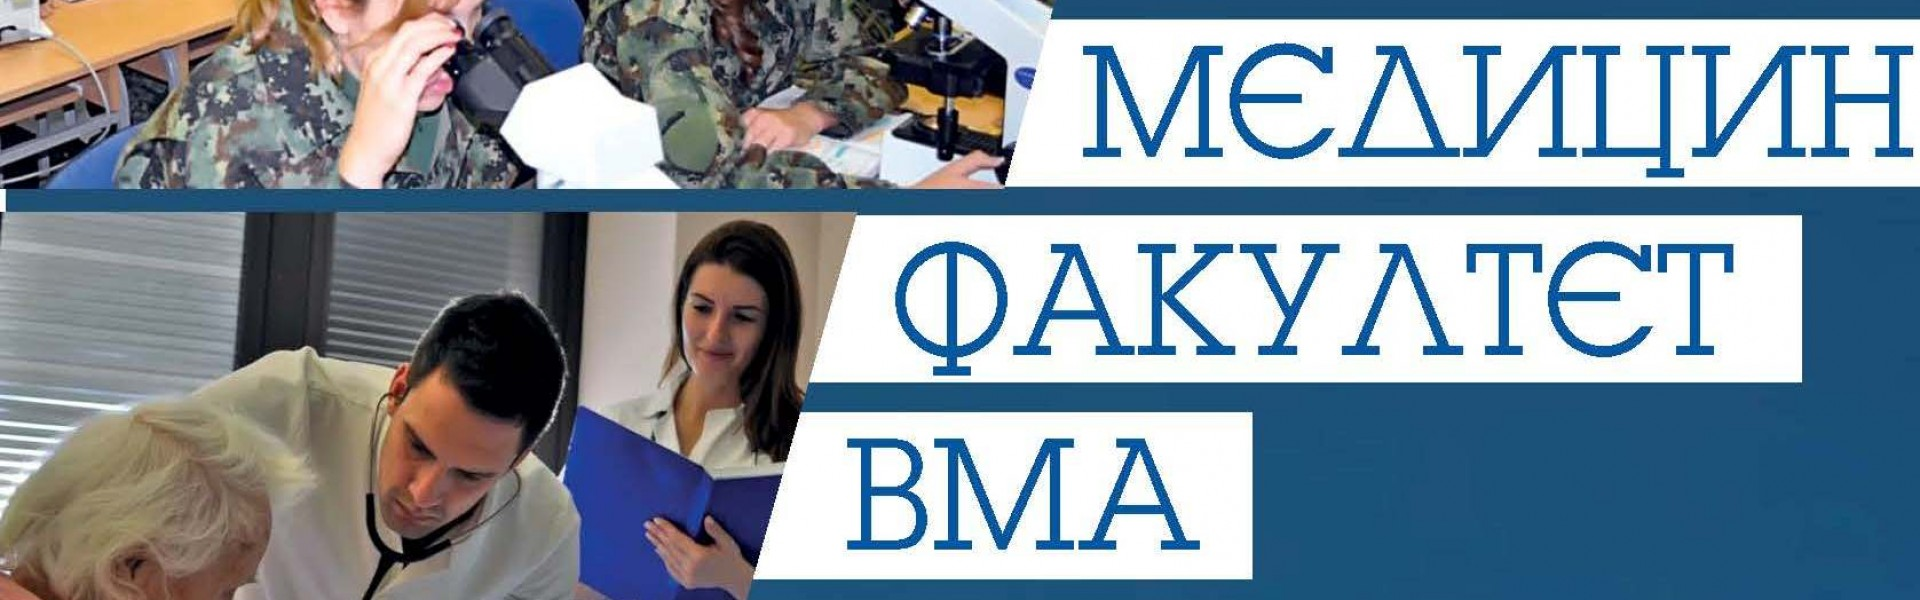 MMA's Medical Faculty enrolment